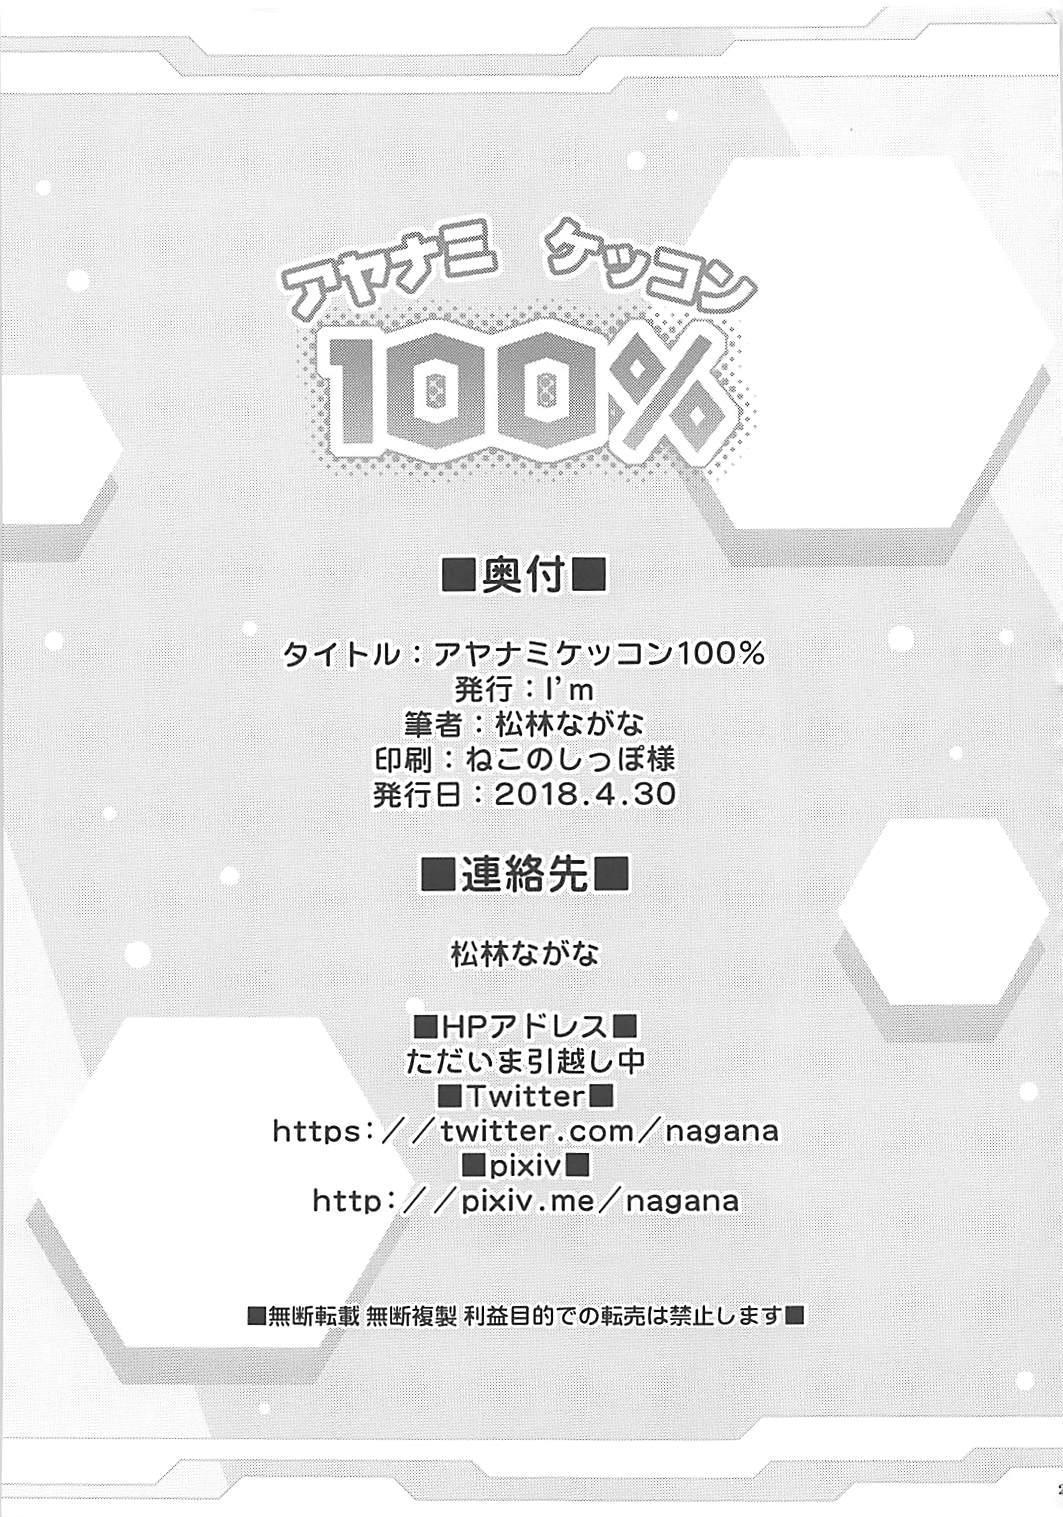 Ayanami Kekkon 100% 19